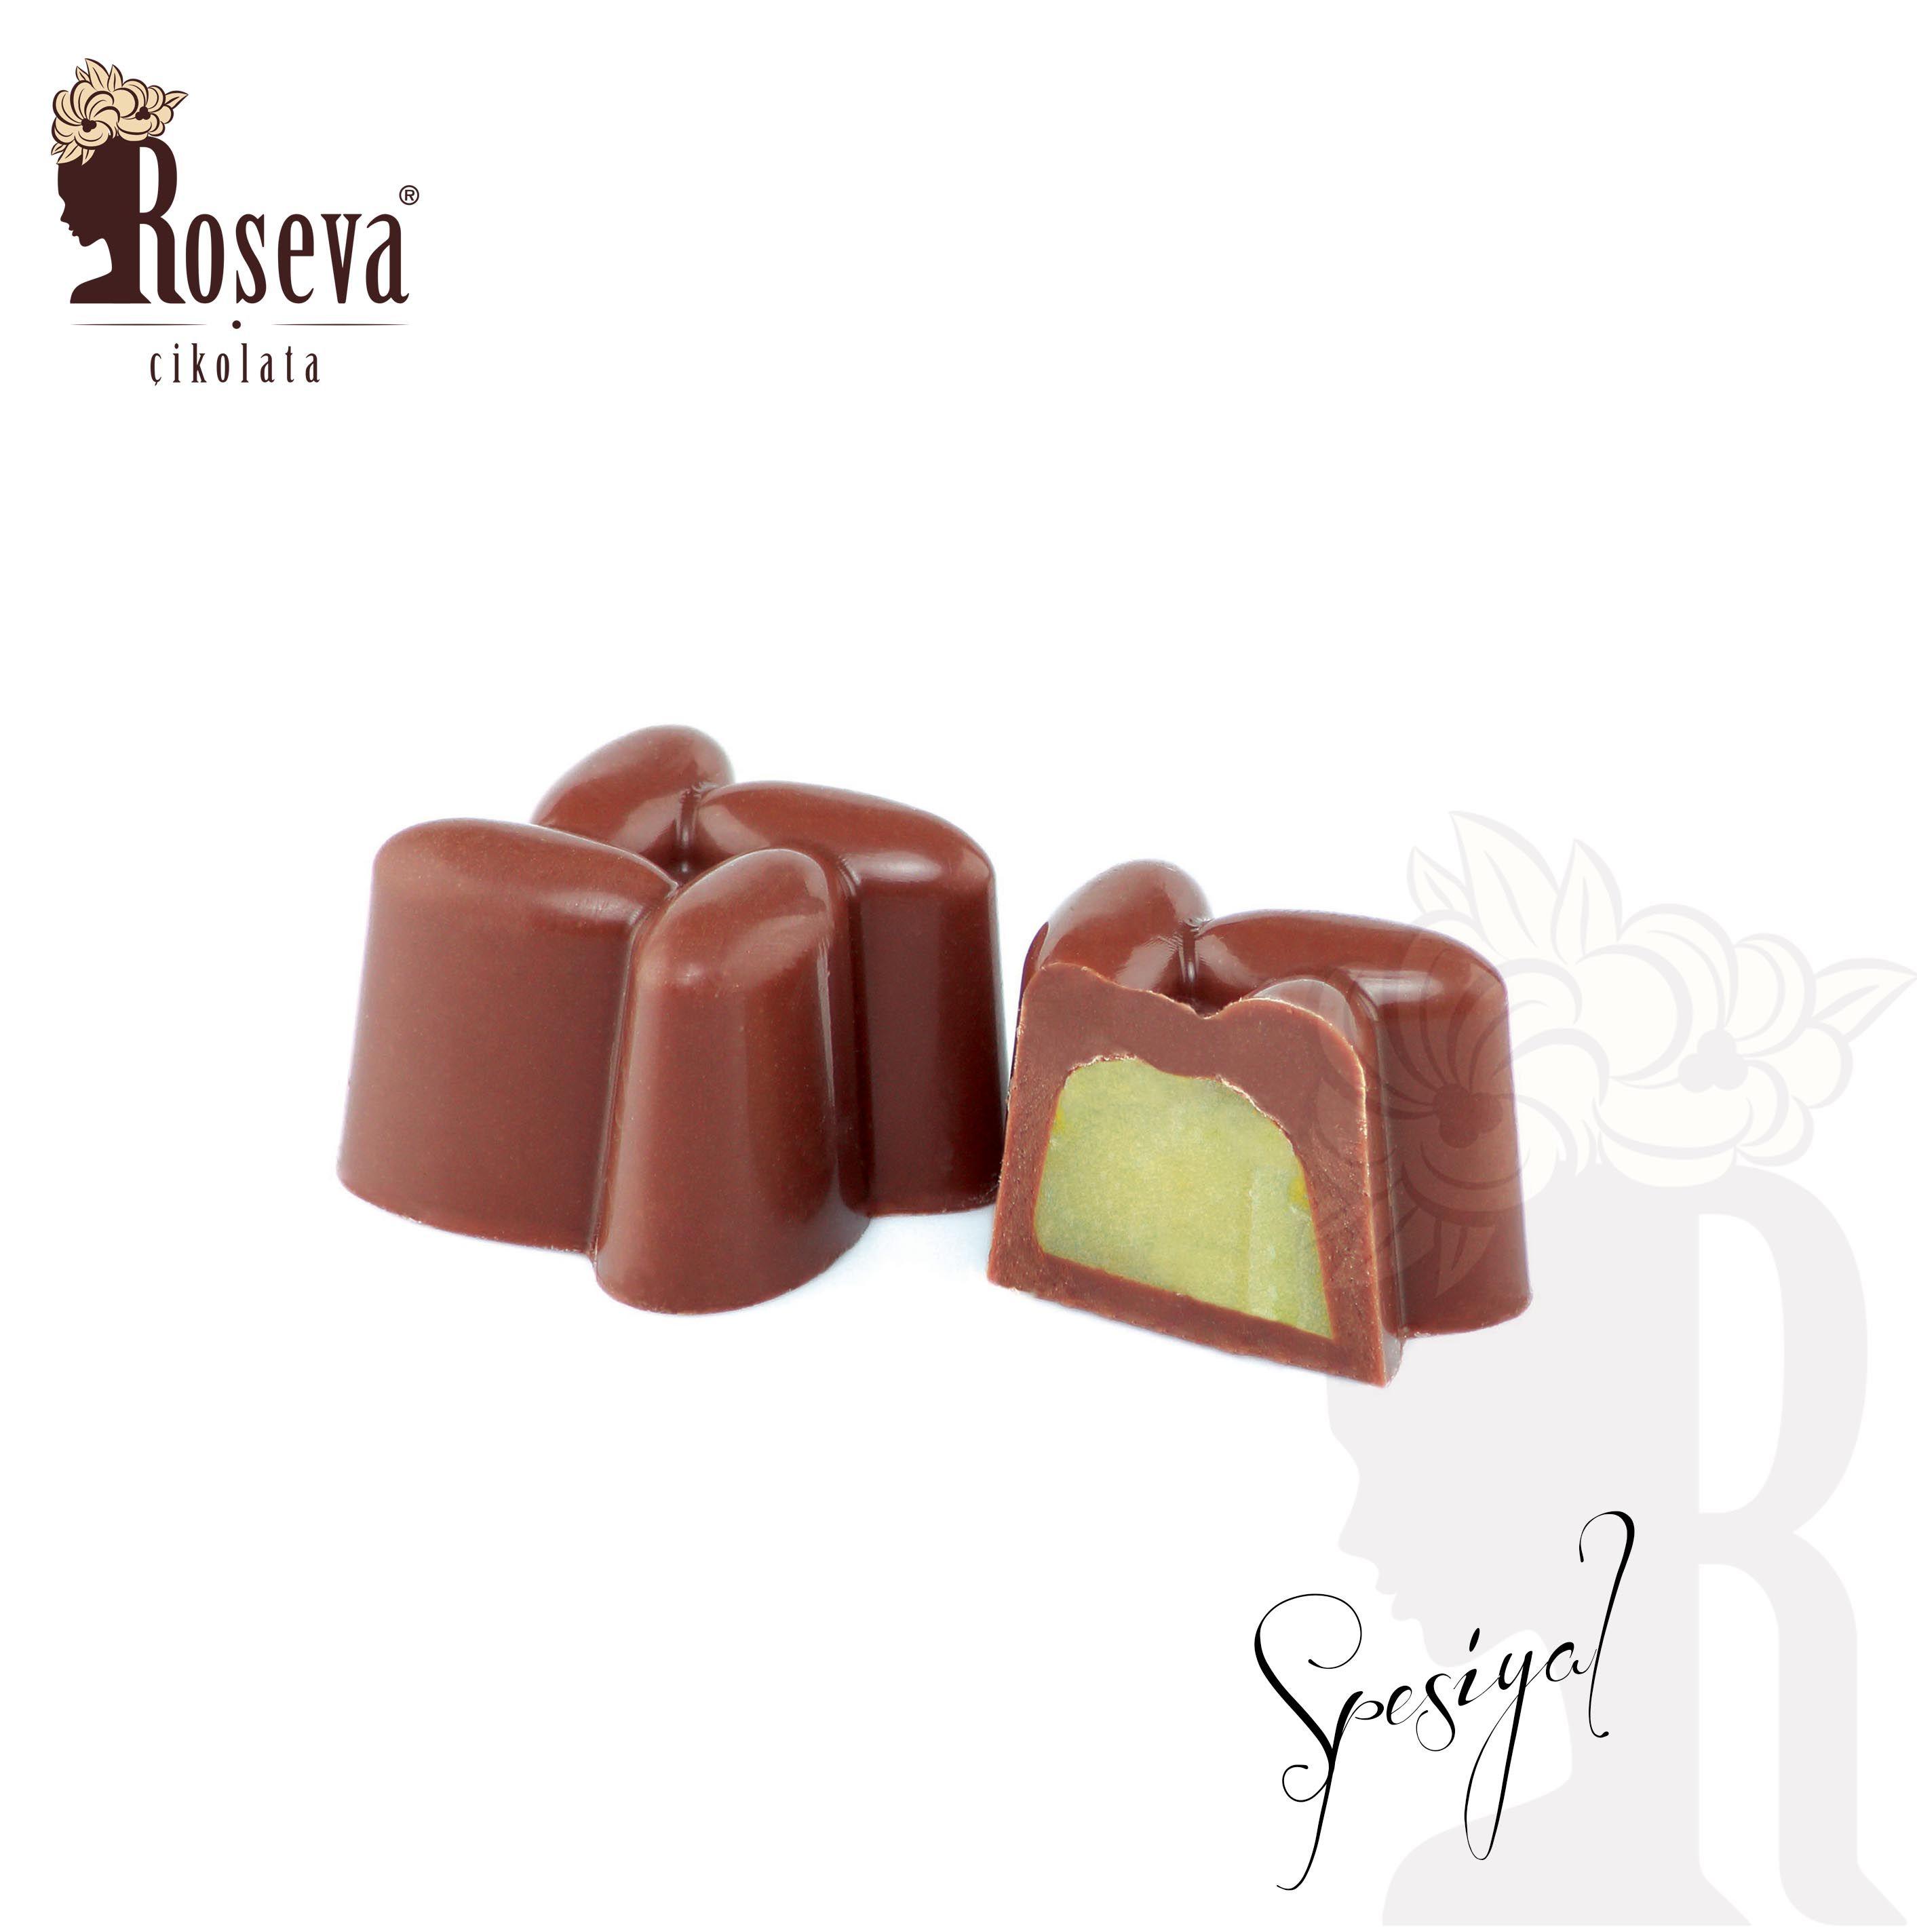 Rosevachocolate Franchise Butik Chocolate Cikolata Beyoglu